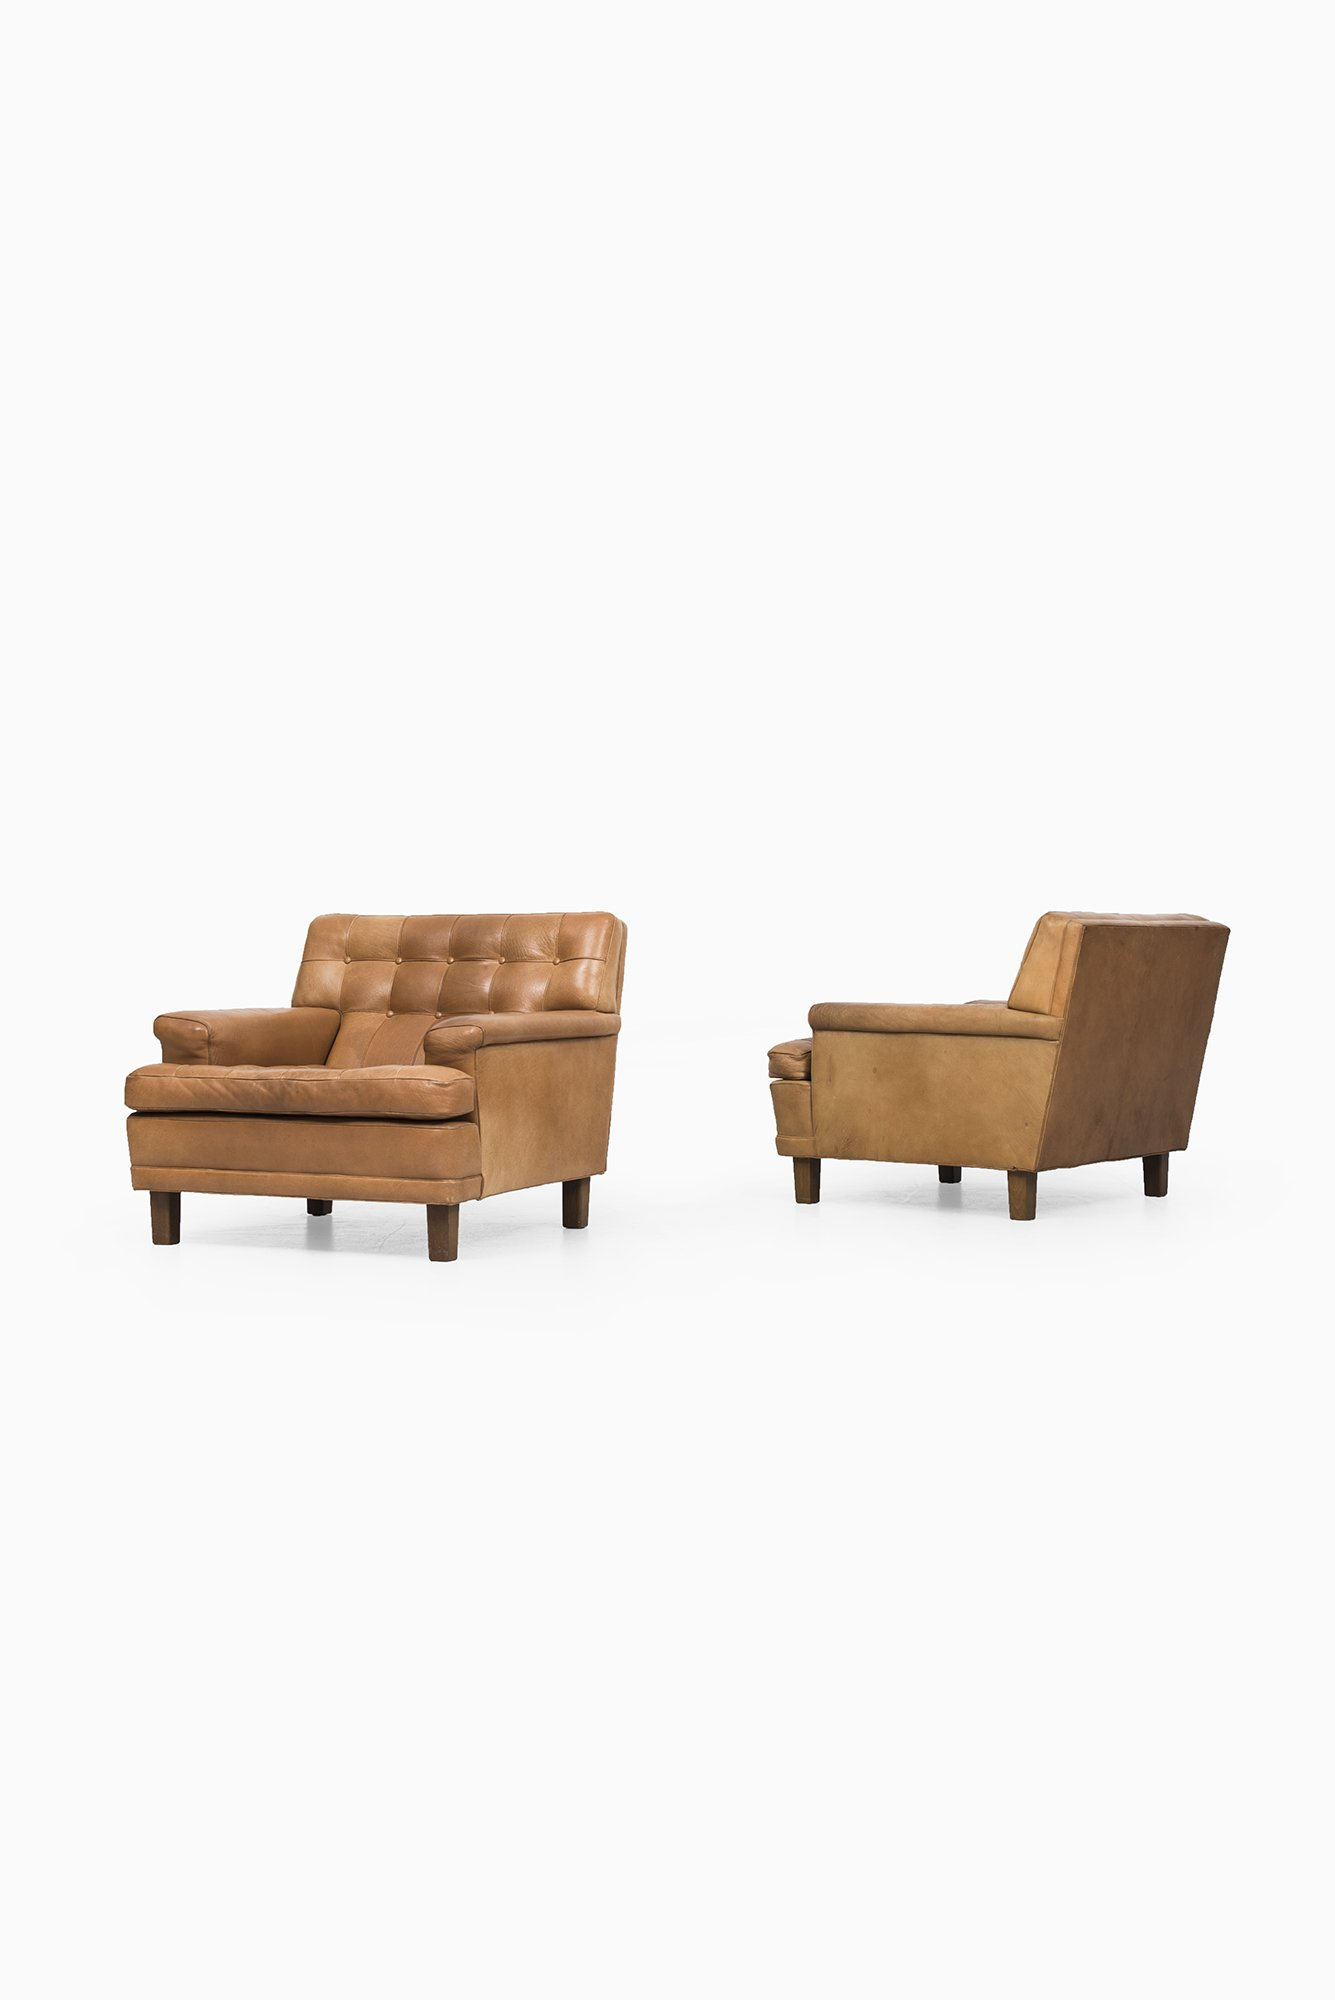 Arne Norell Merkur easy chairs in cognac brown leather at Studio Schalling